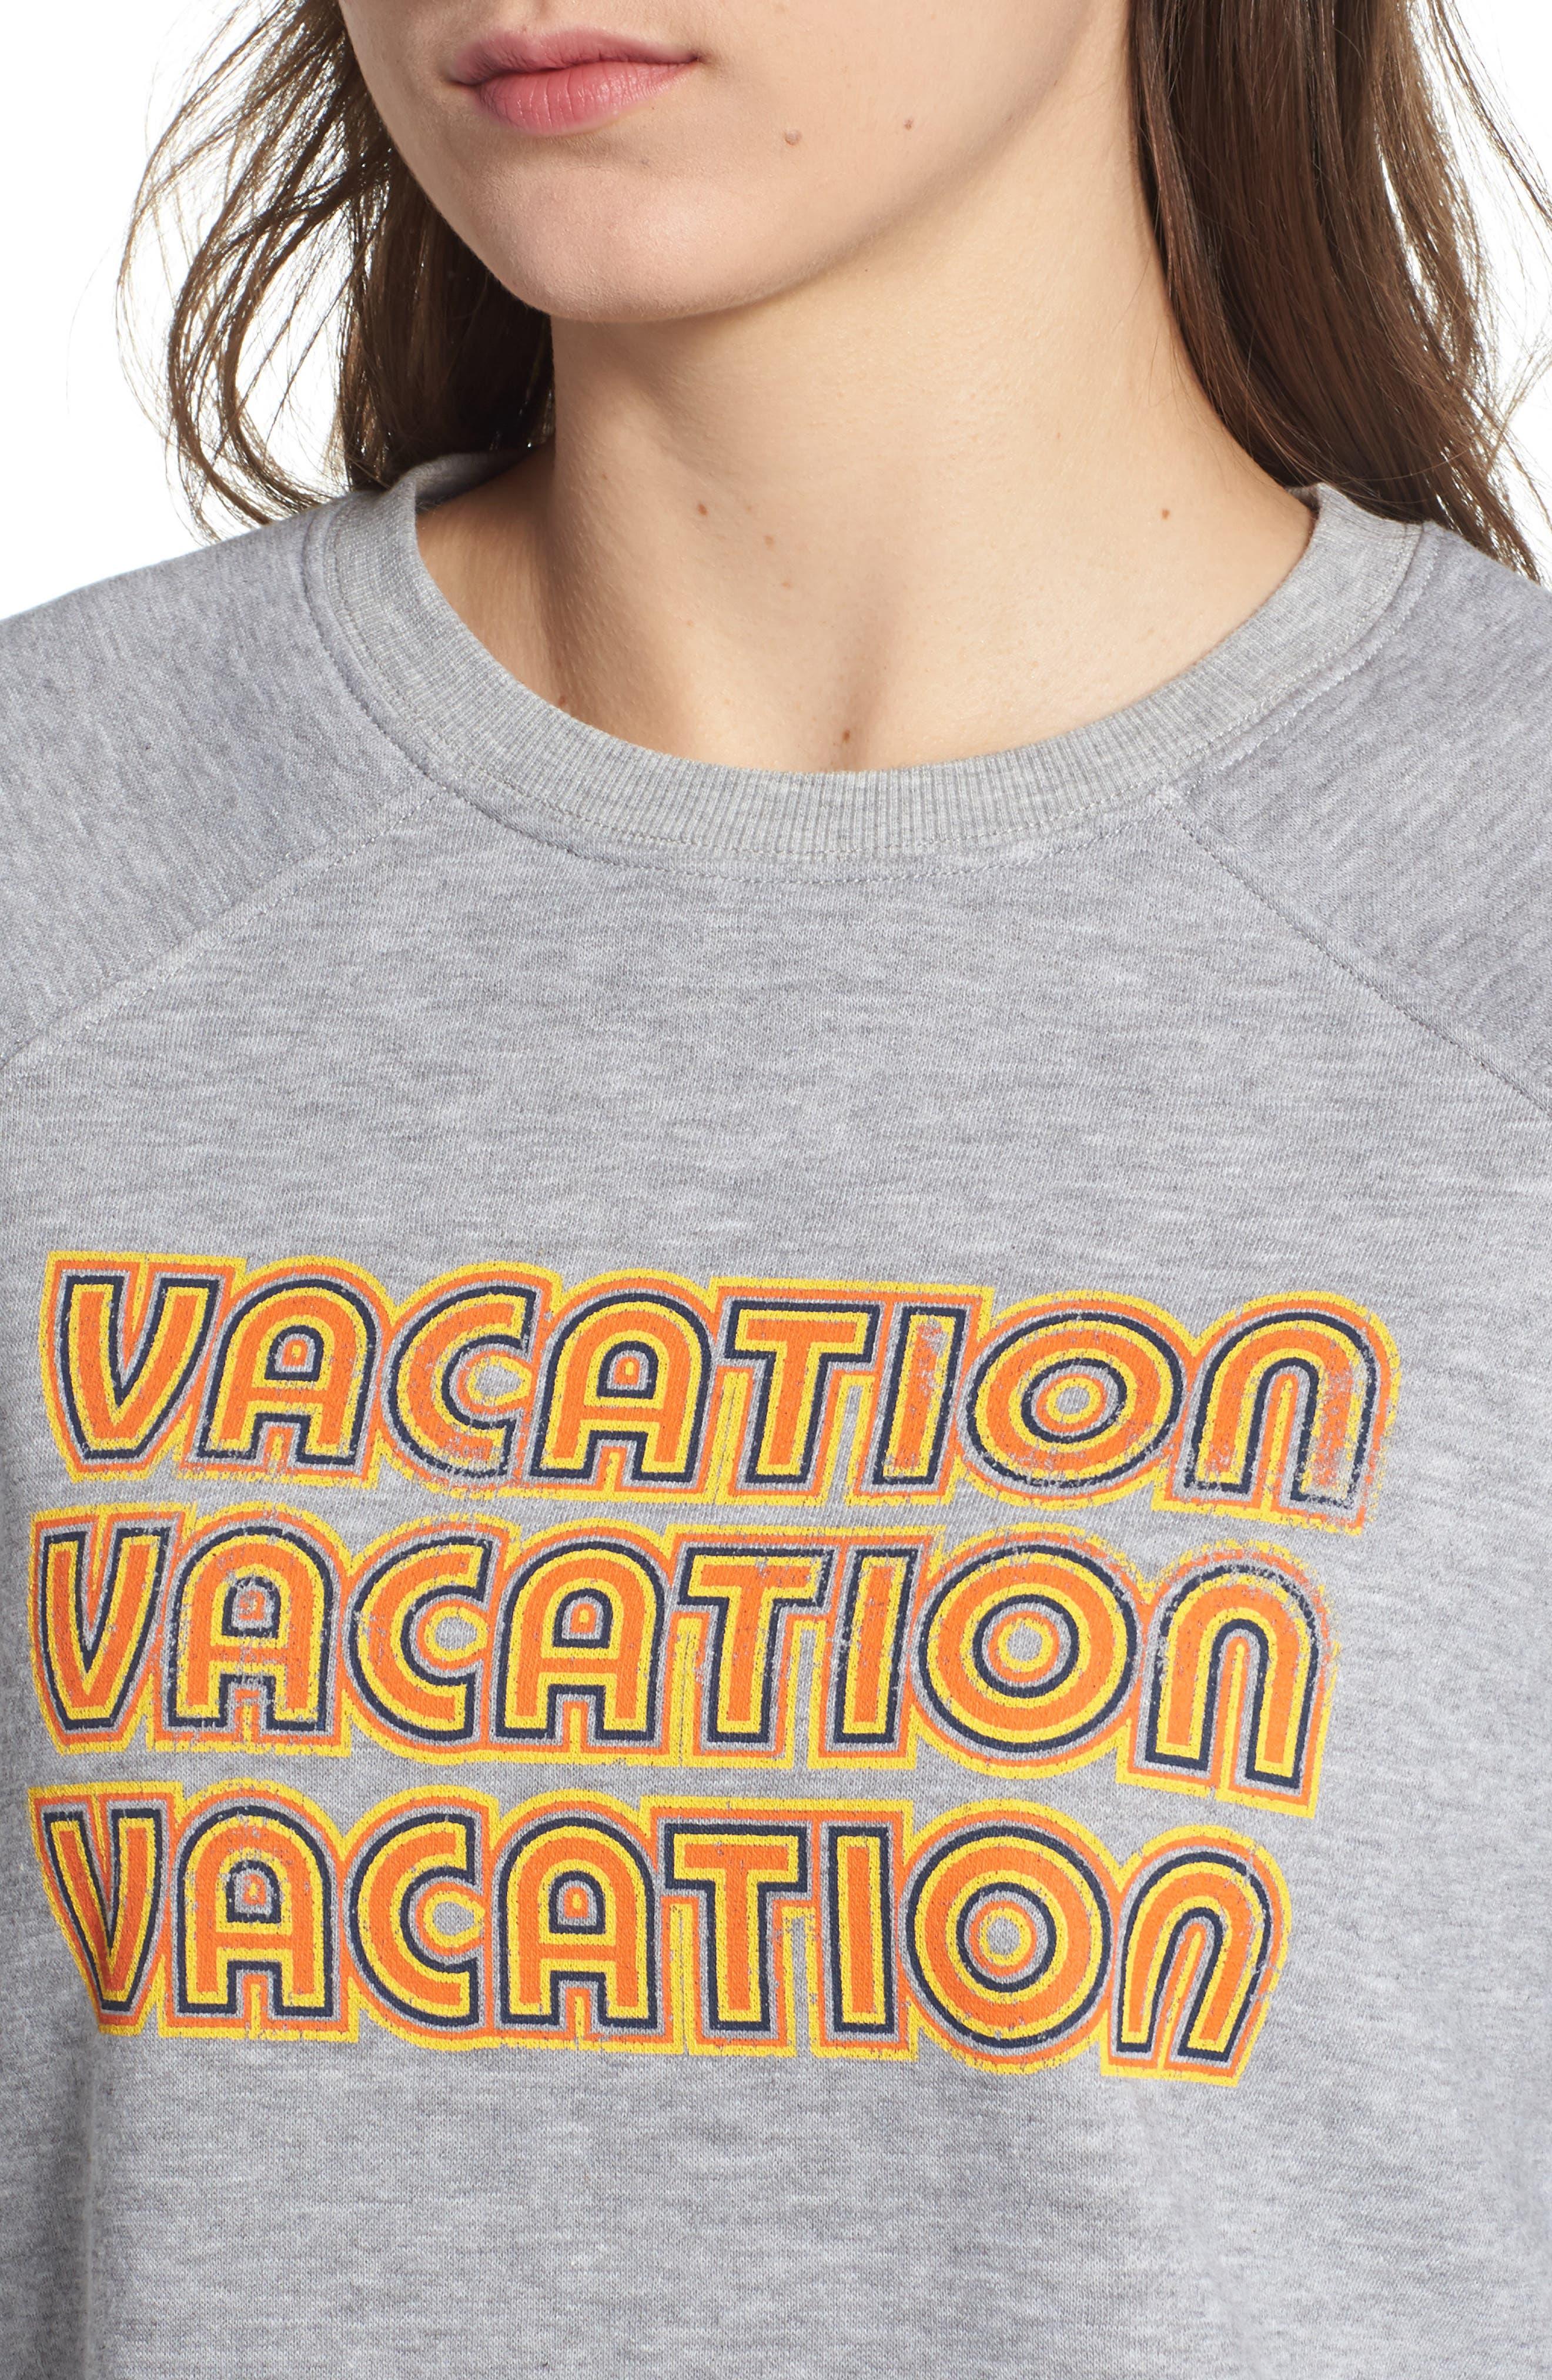 REBECCA MINKOFF,                             Vacation Sweatshirt,                             Alternate thumbnail 4, color,                             026